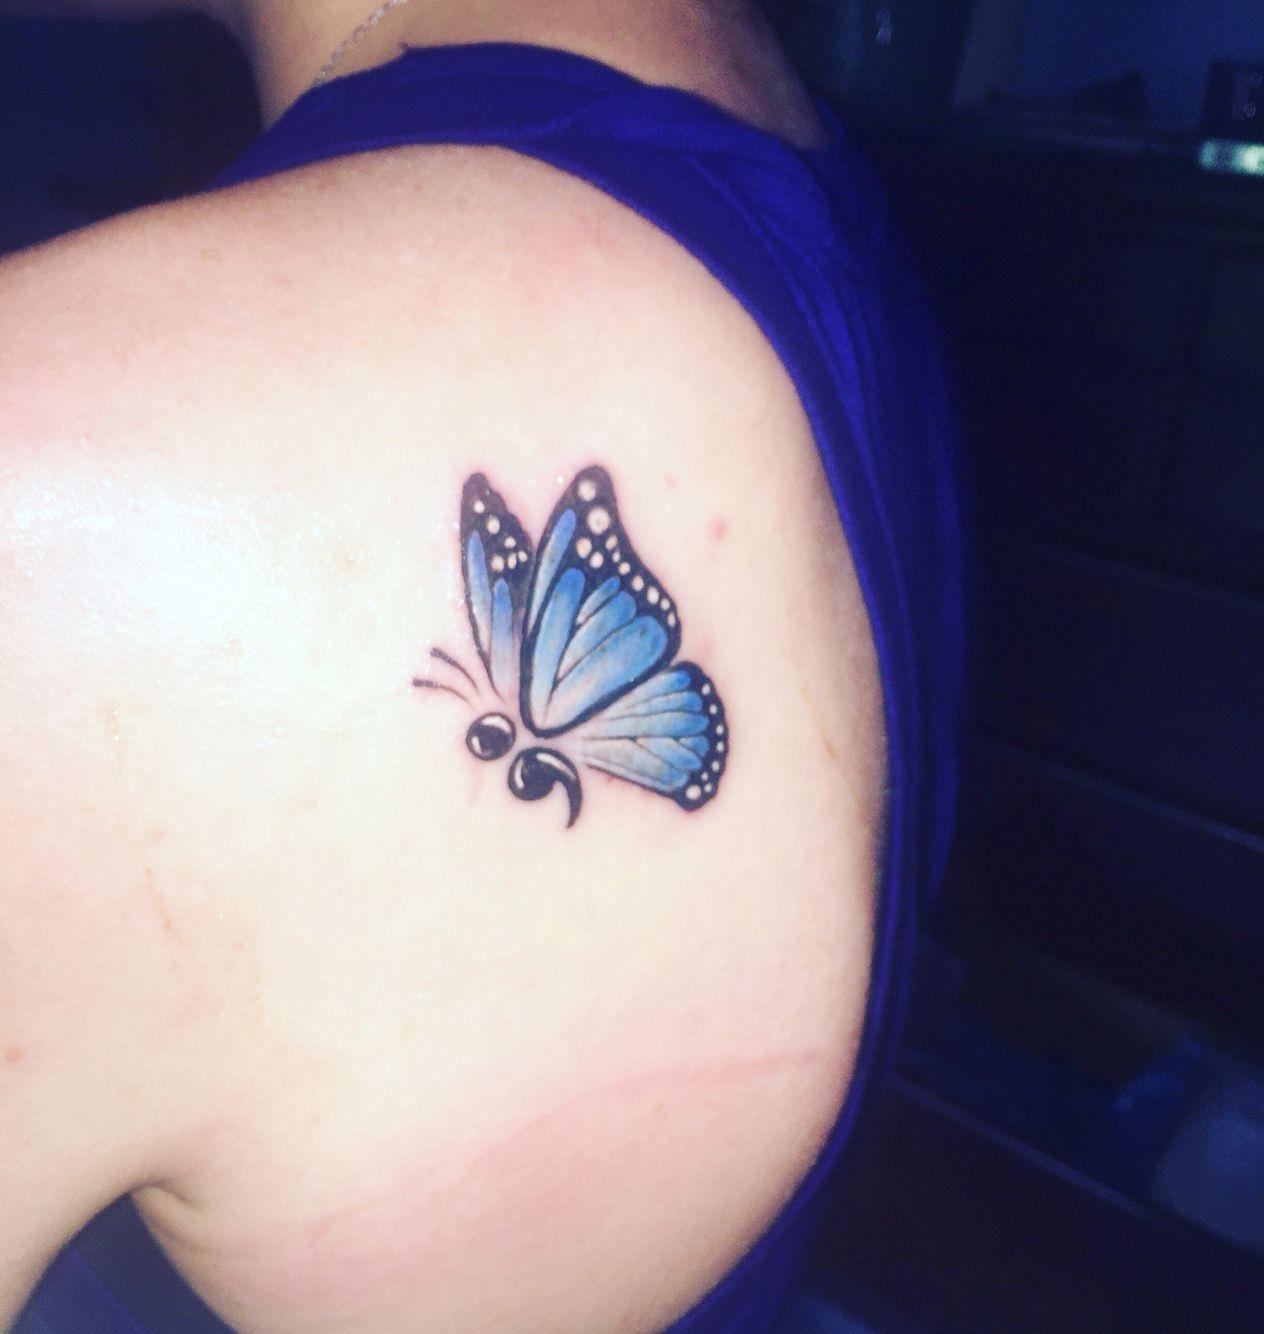 Semicolon Butterfly Tattoo Photos Semicolon Tattoo Tattoos inside dimensions 1264 X 1334